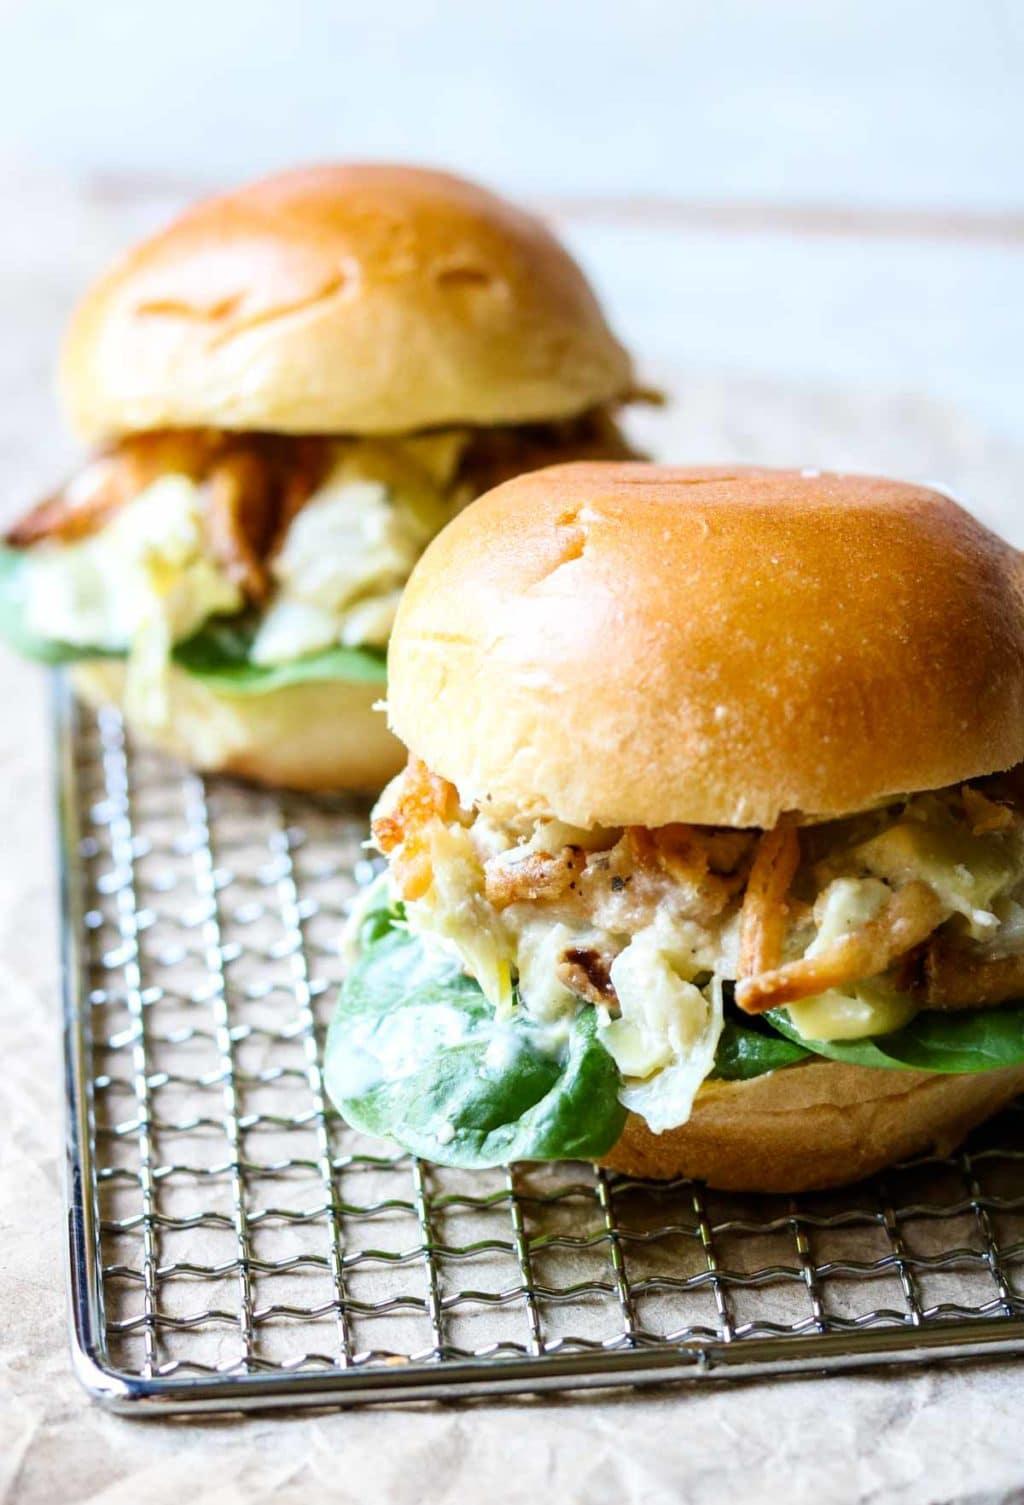 Two Chicken Salad Sandwiches on brioche rolls sitting on a silver grate